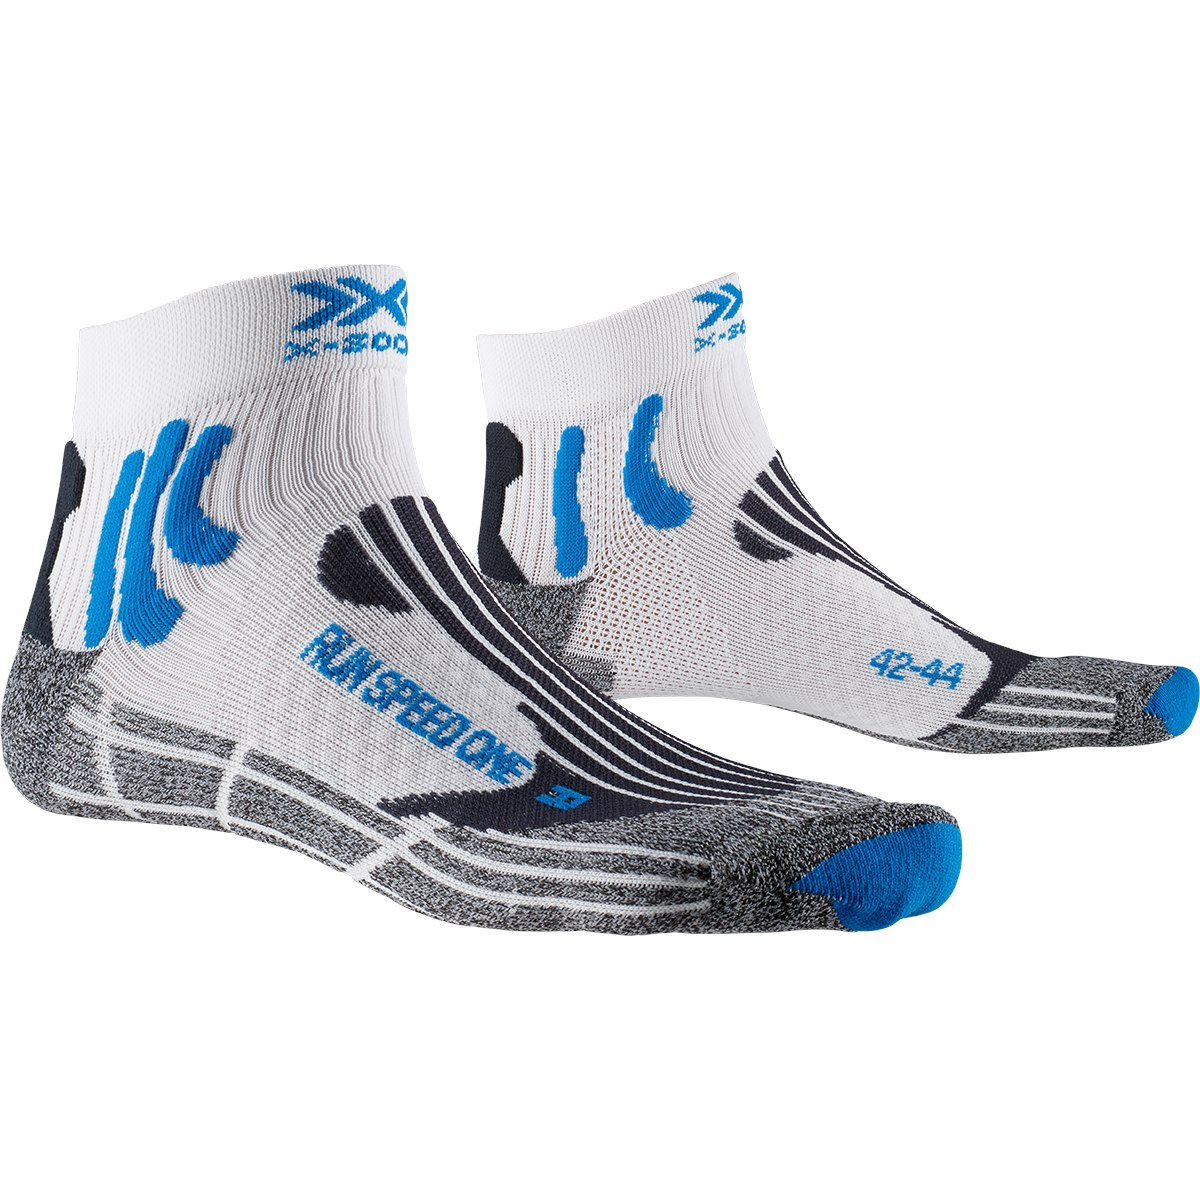 X-Socks Run Speed One Laufsocken - white/twyce blue/grey melange